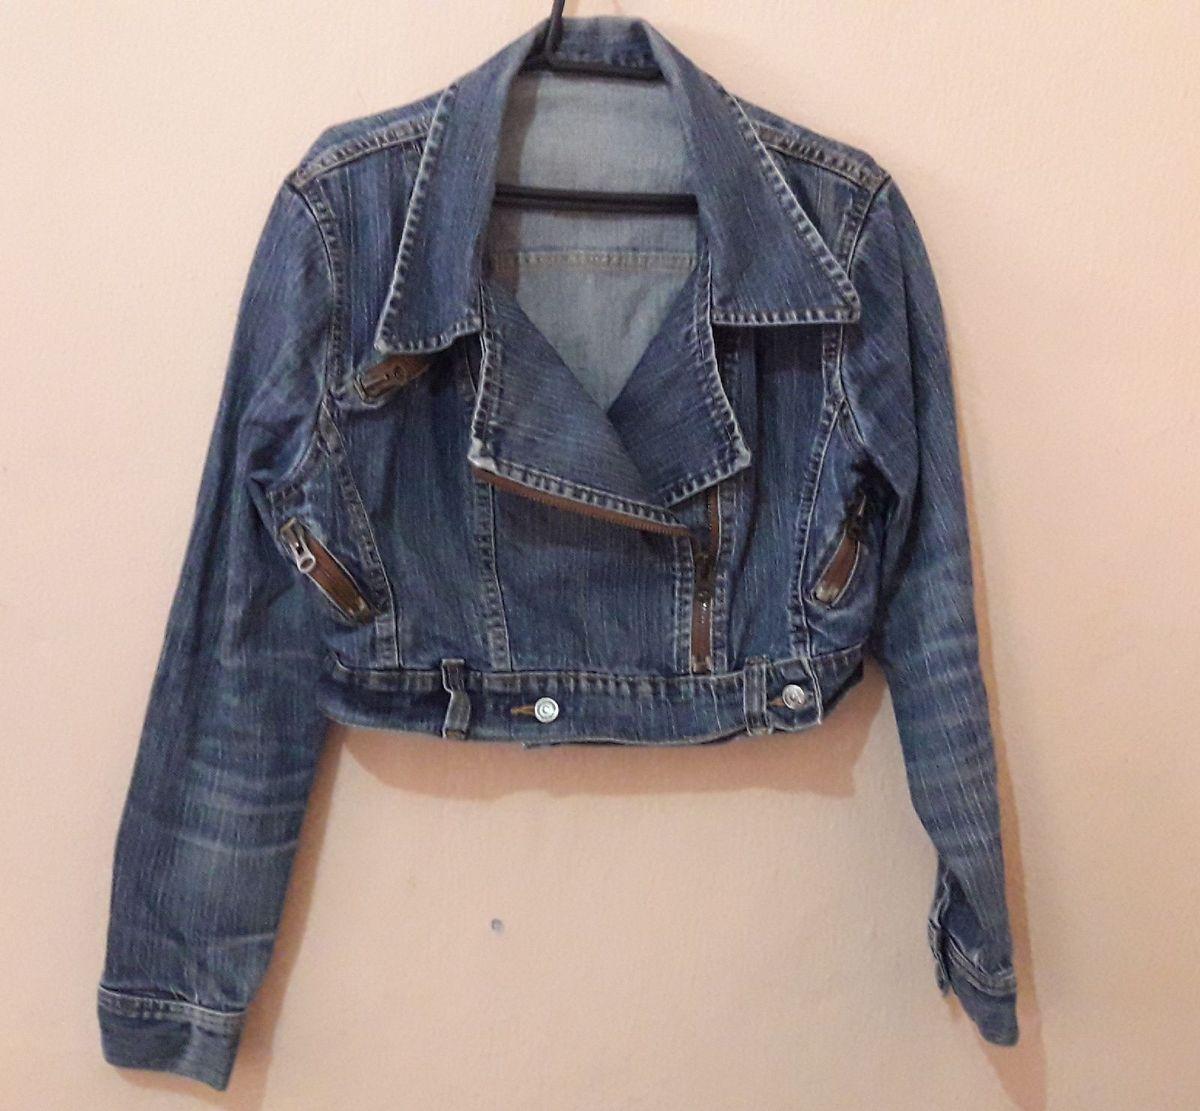 jaqueta jeans traxy - casaquinhos traxy